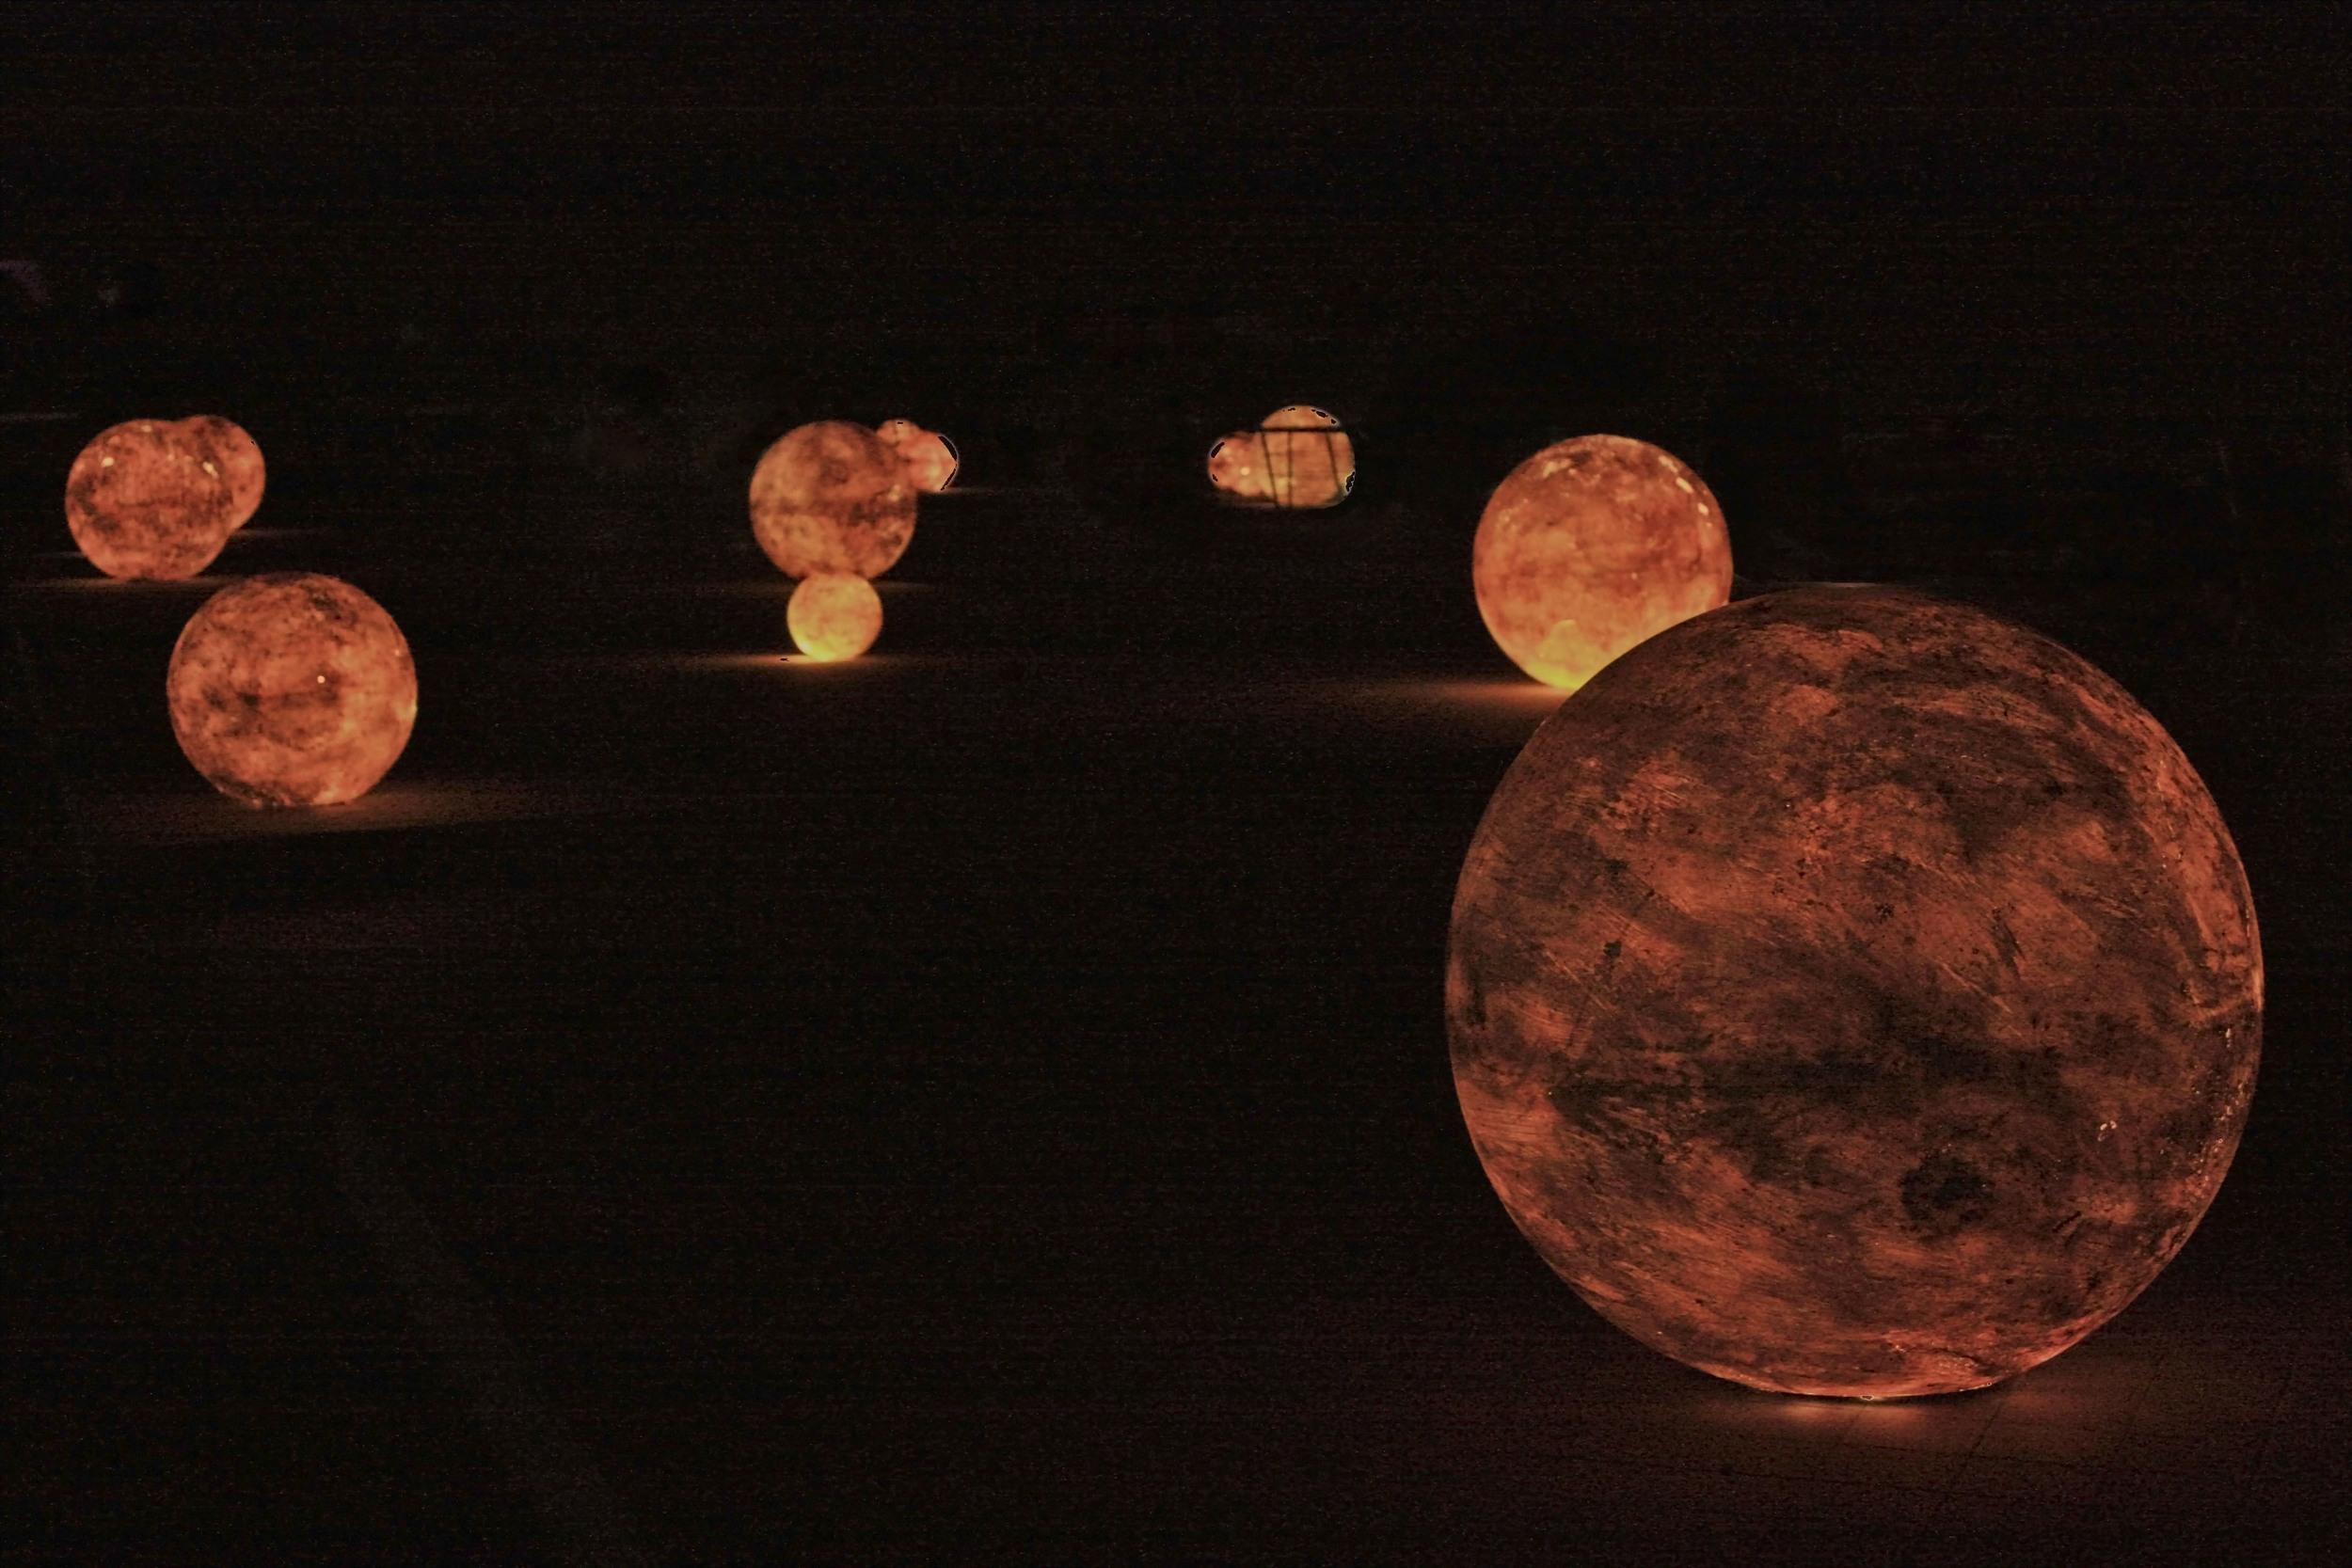 Light Balls in the Night  M105